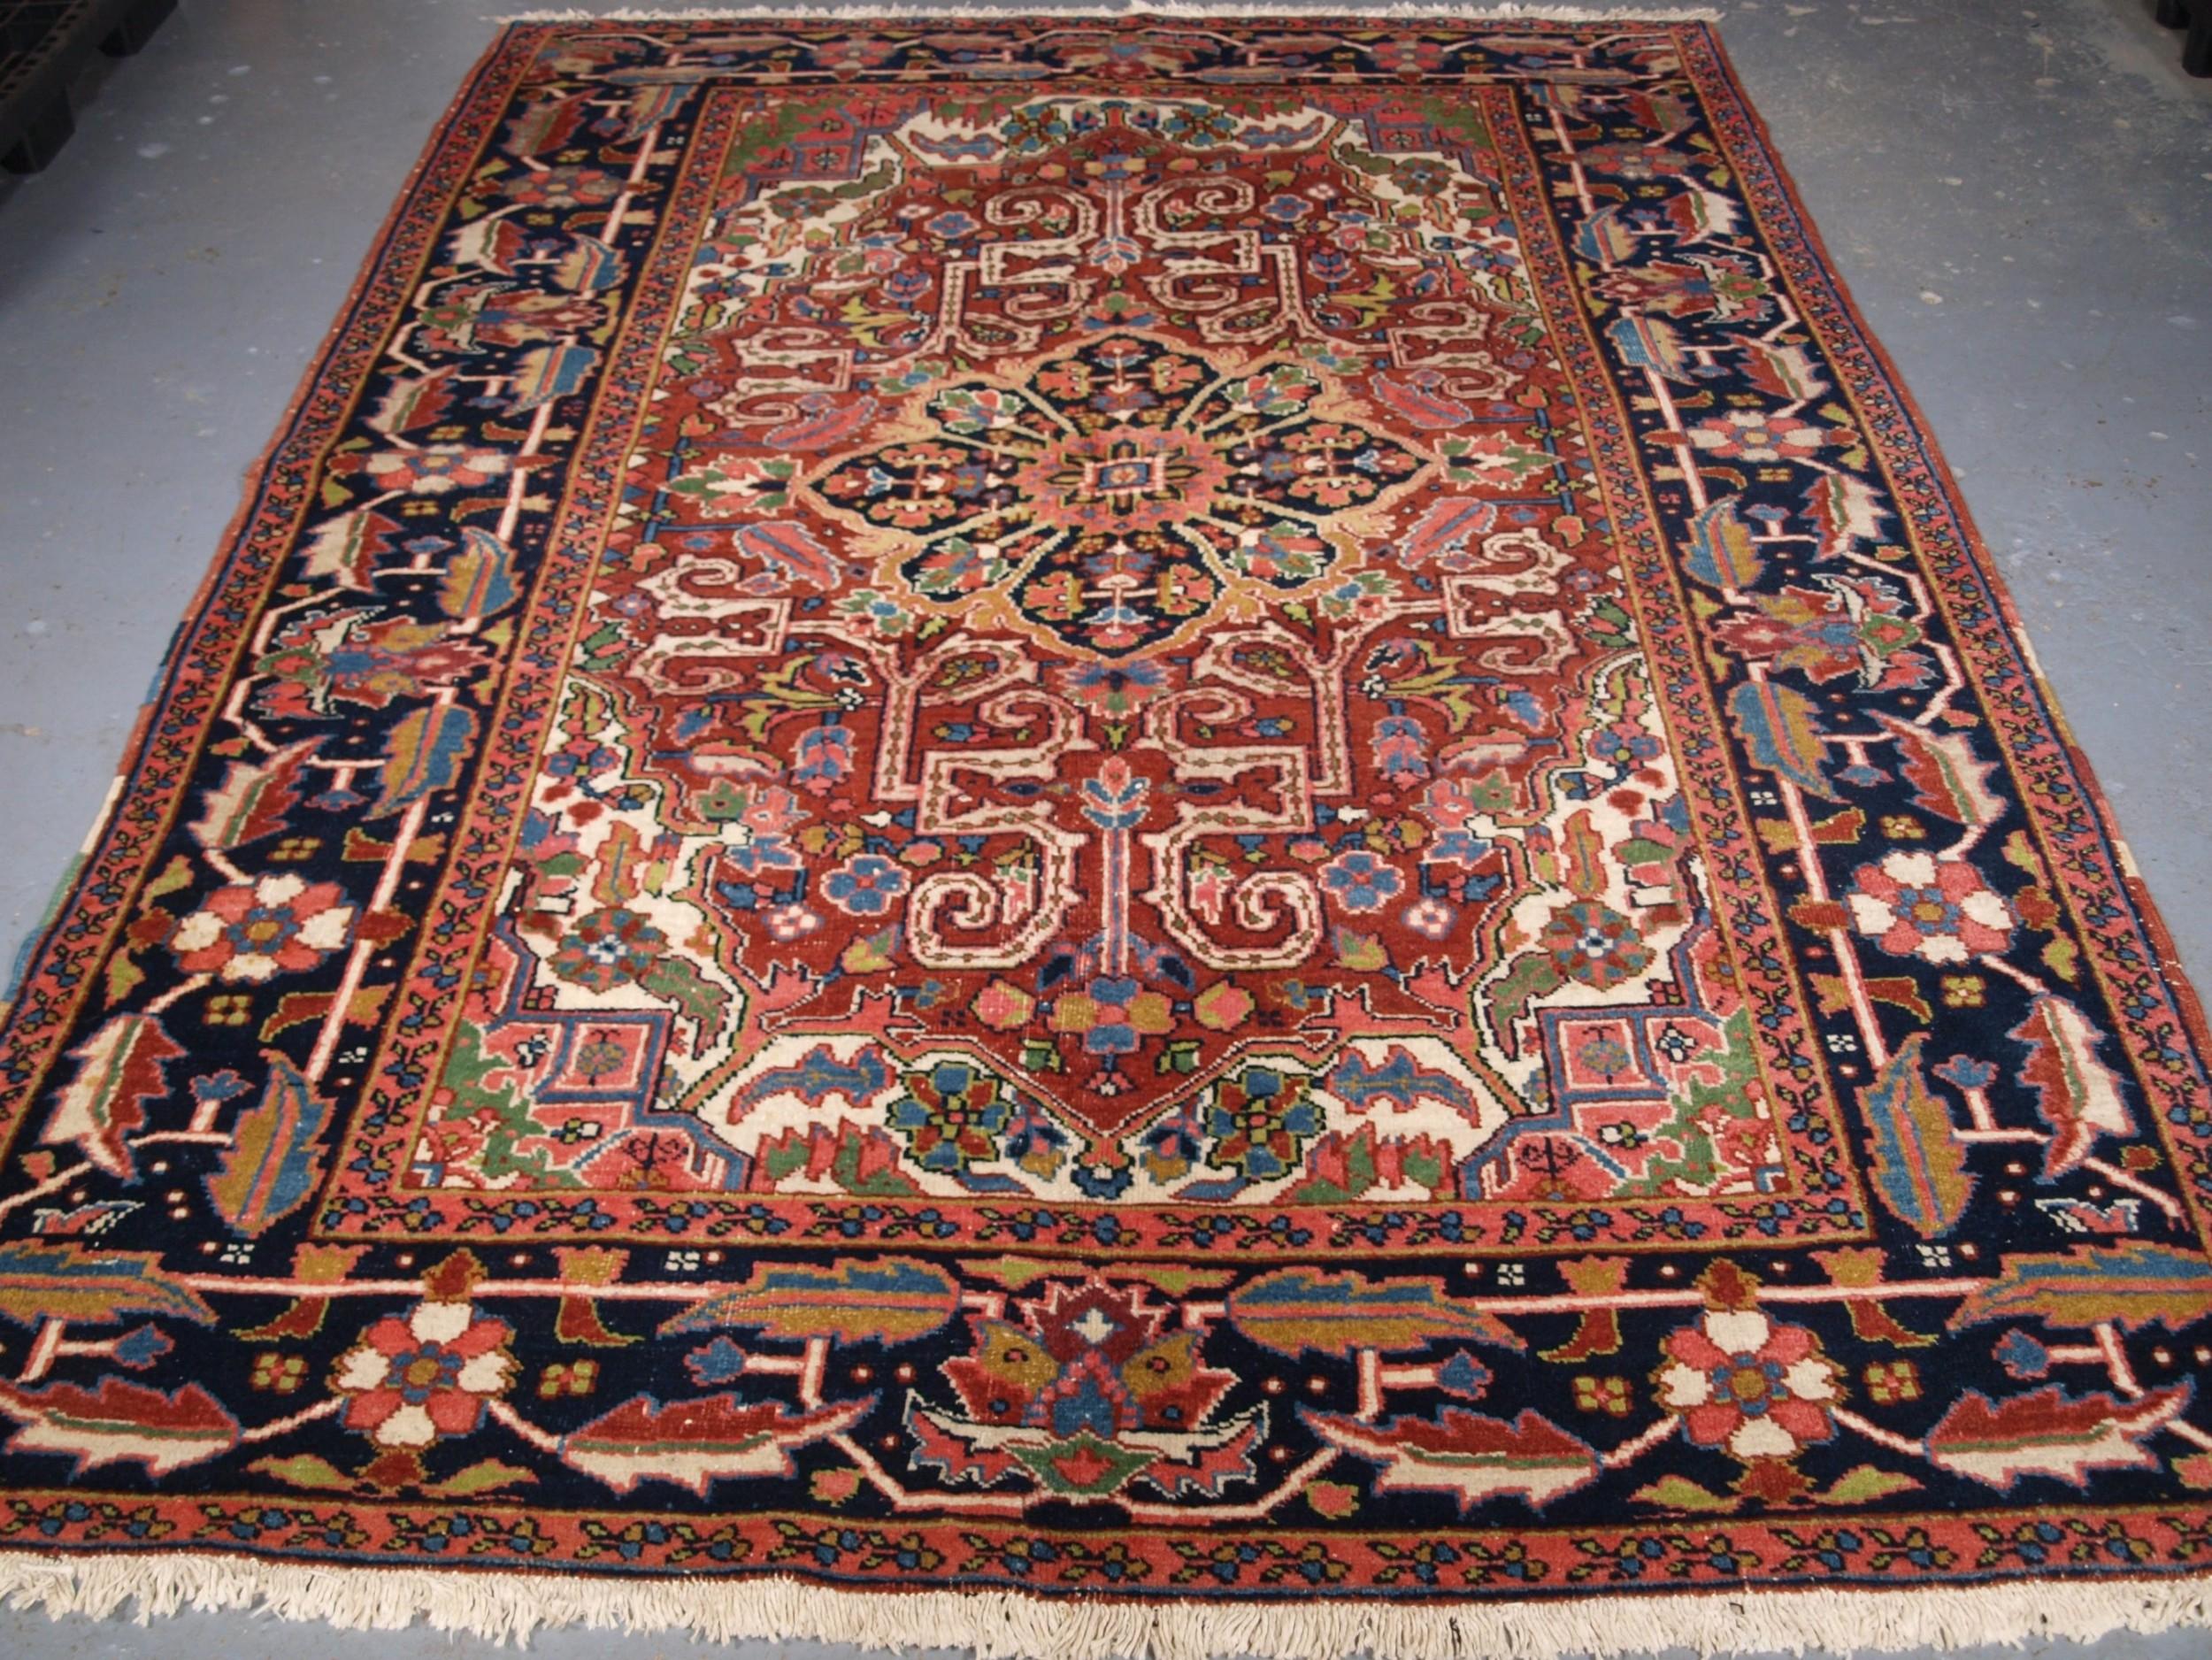 antique heriz carpet scarce small room size circa 190020